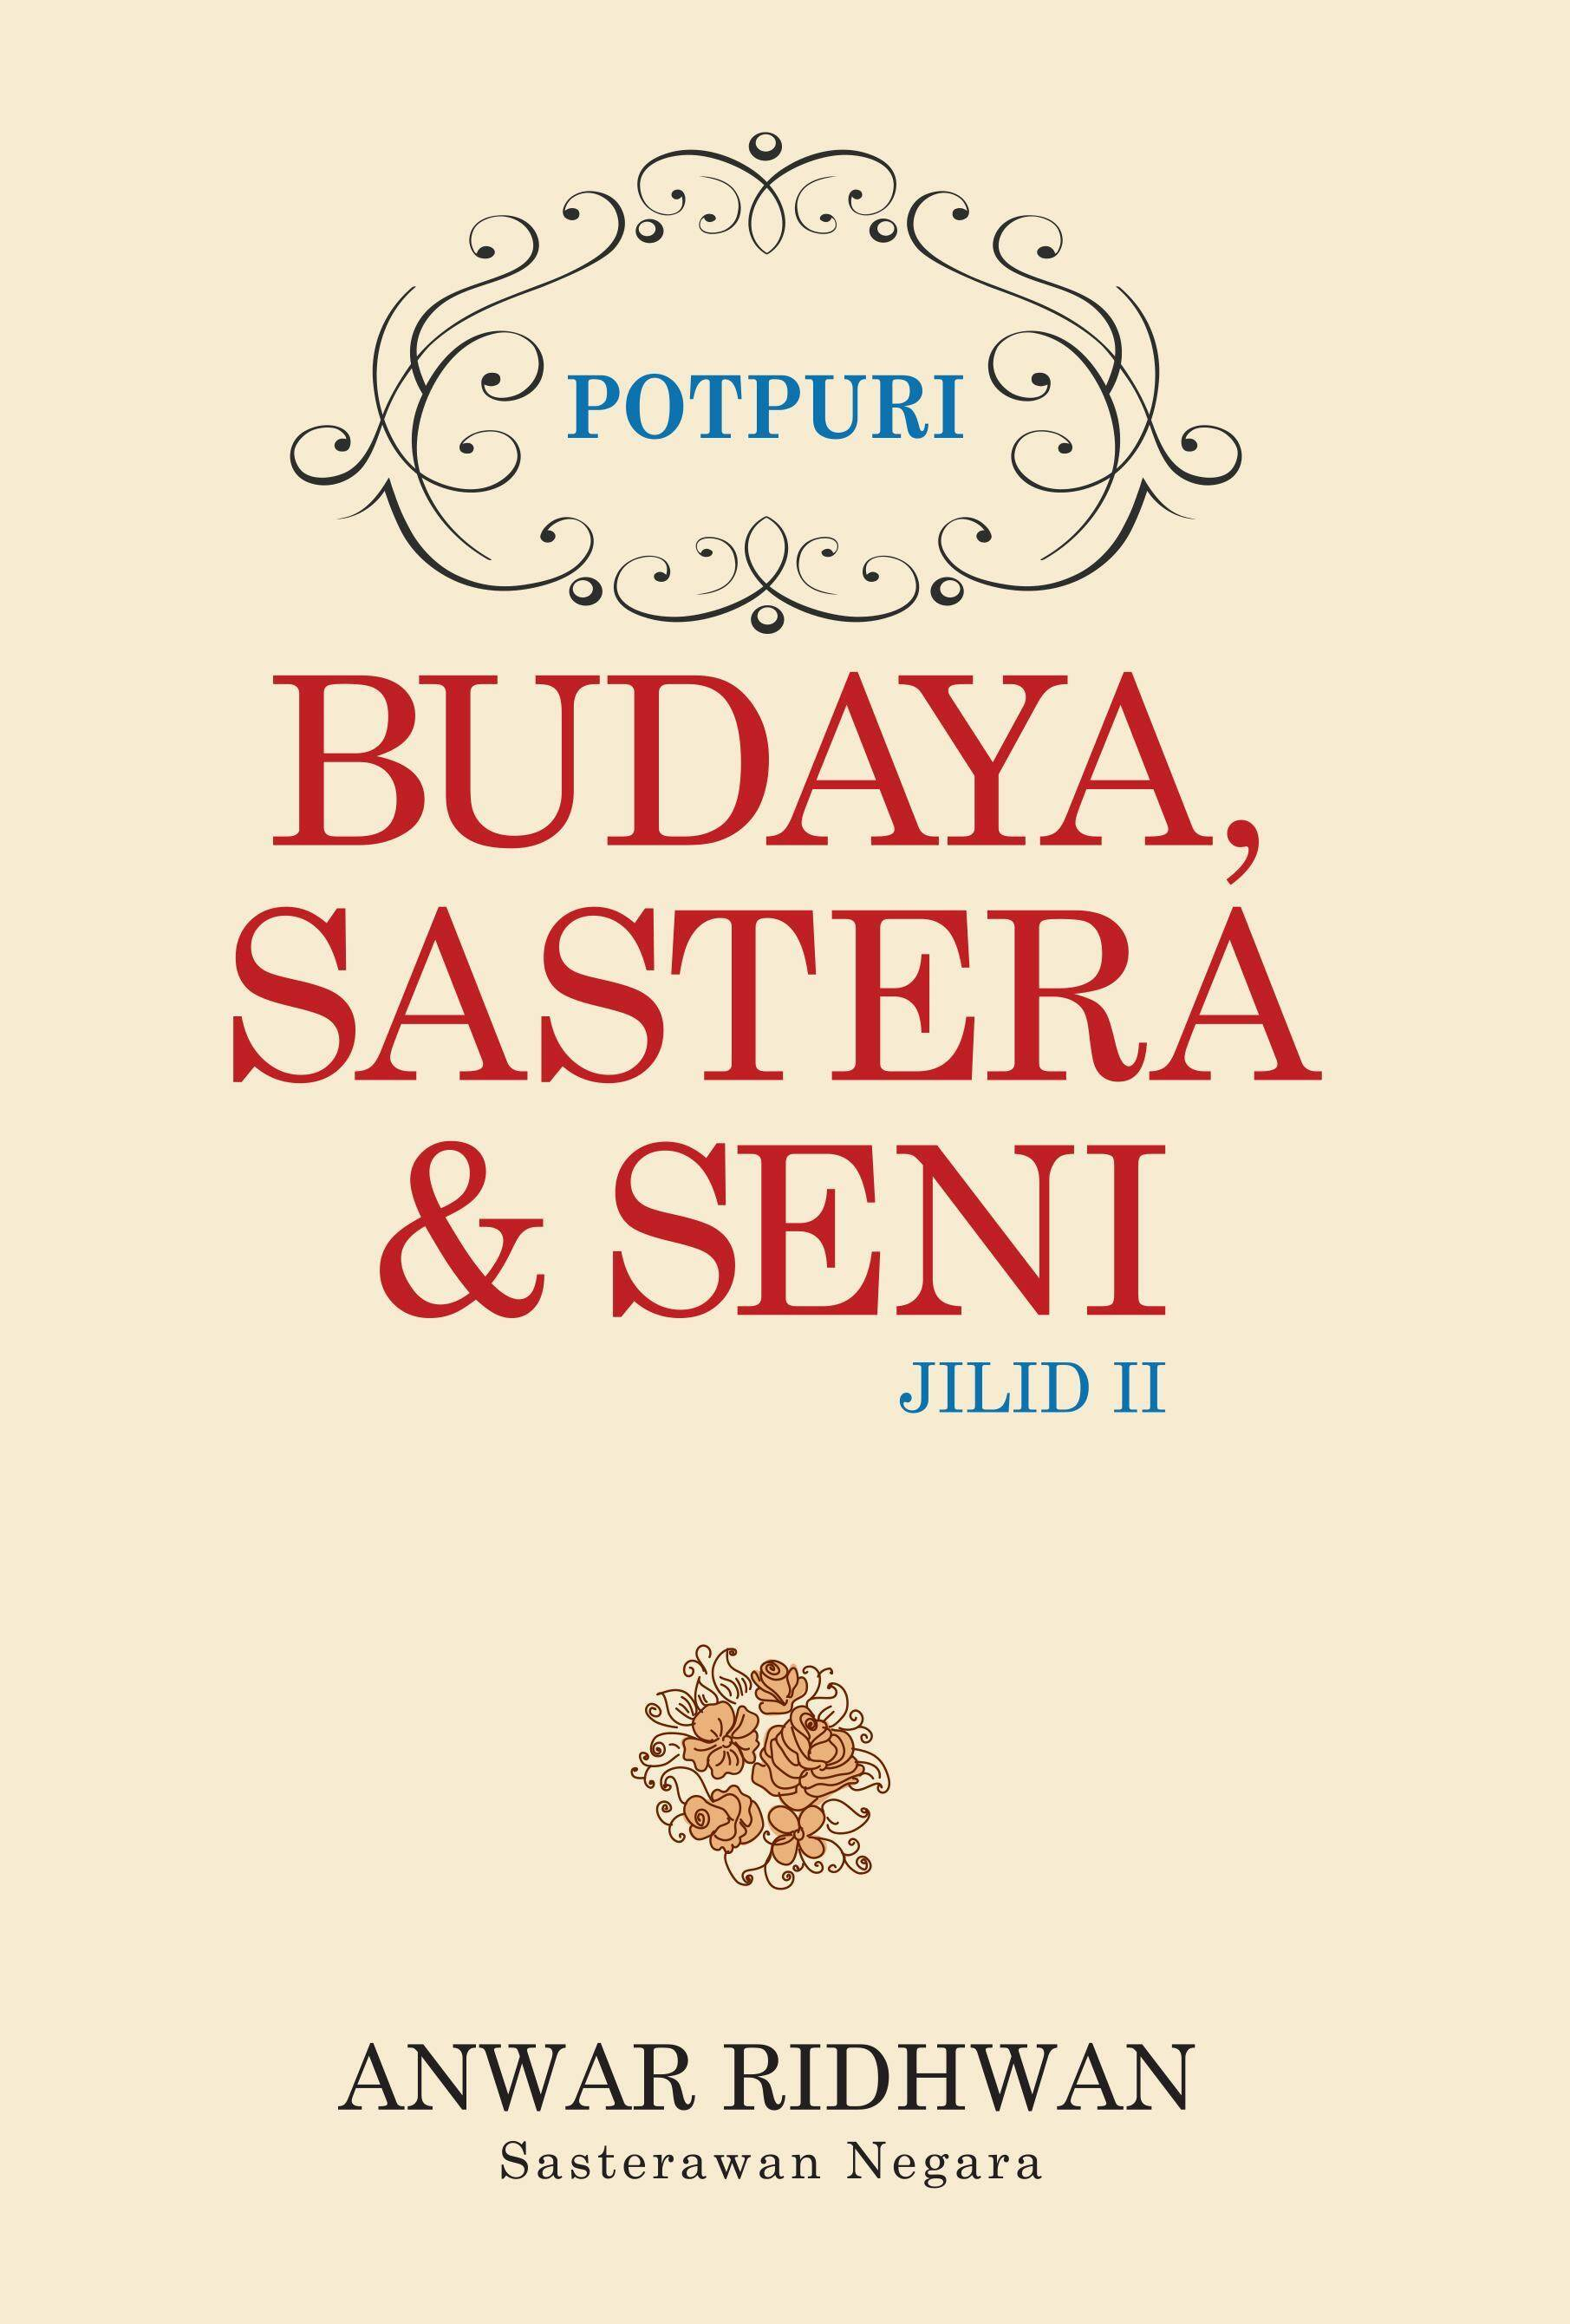 Potpuri: Budaya, Sastera & Seni (Jilid 2)